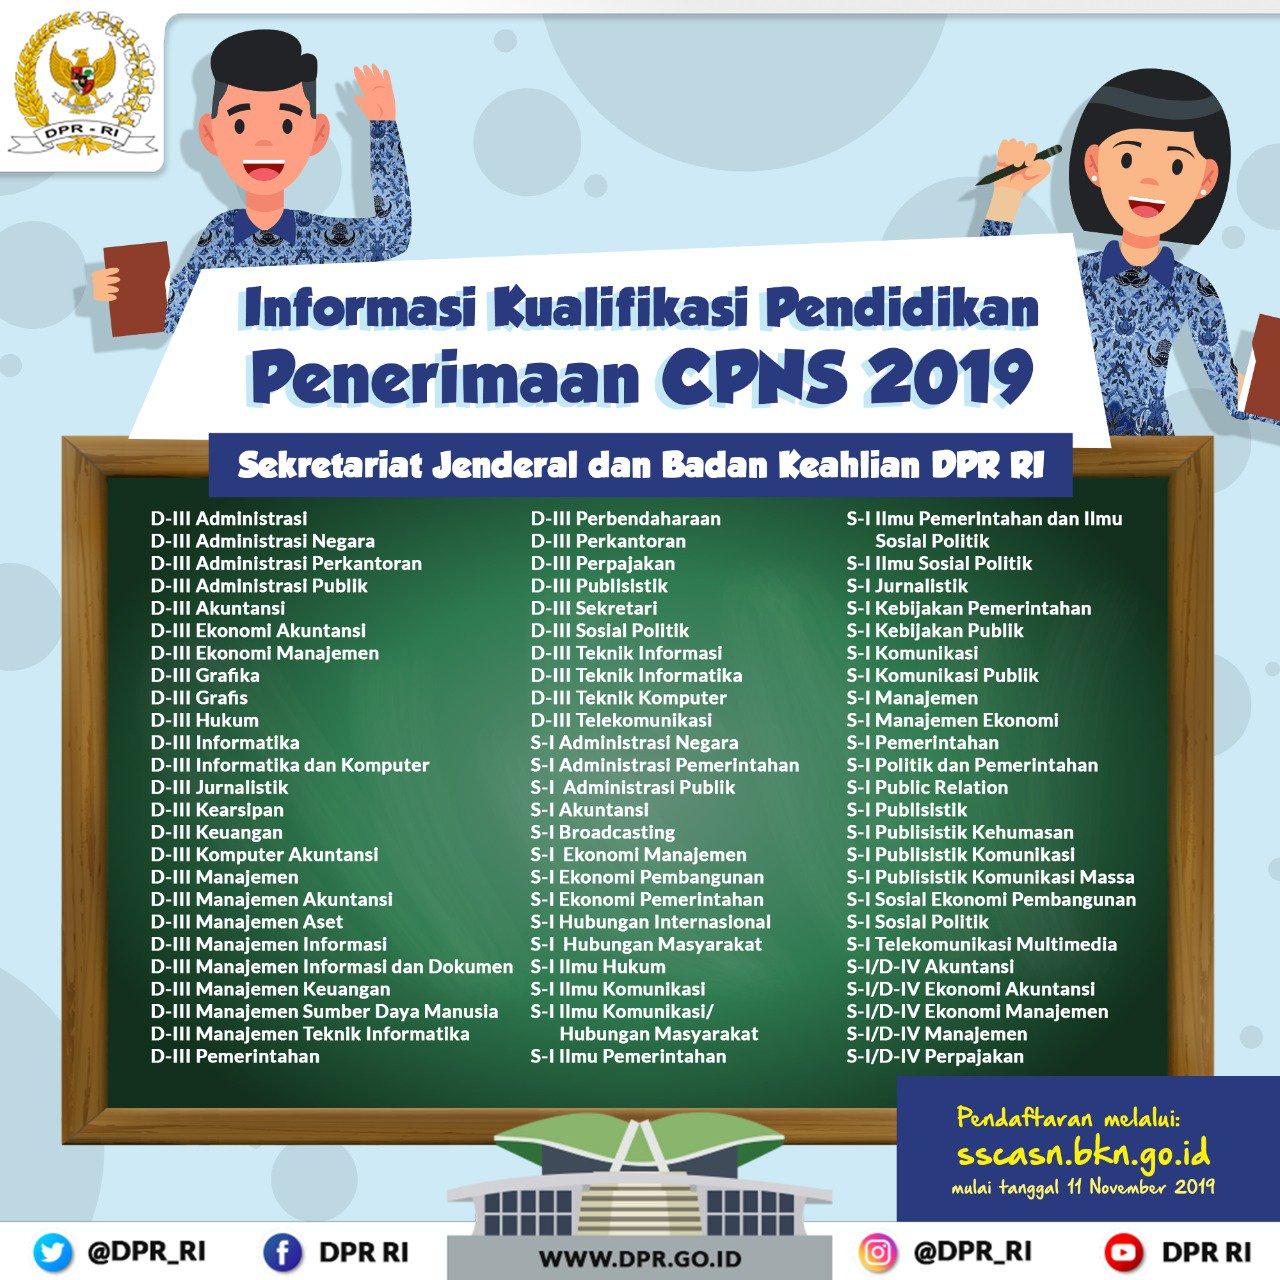 Penerimaan CPNS Sekretariat Jenderal dan Badan Keahlian DPR RI Tahun 2019